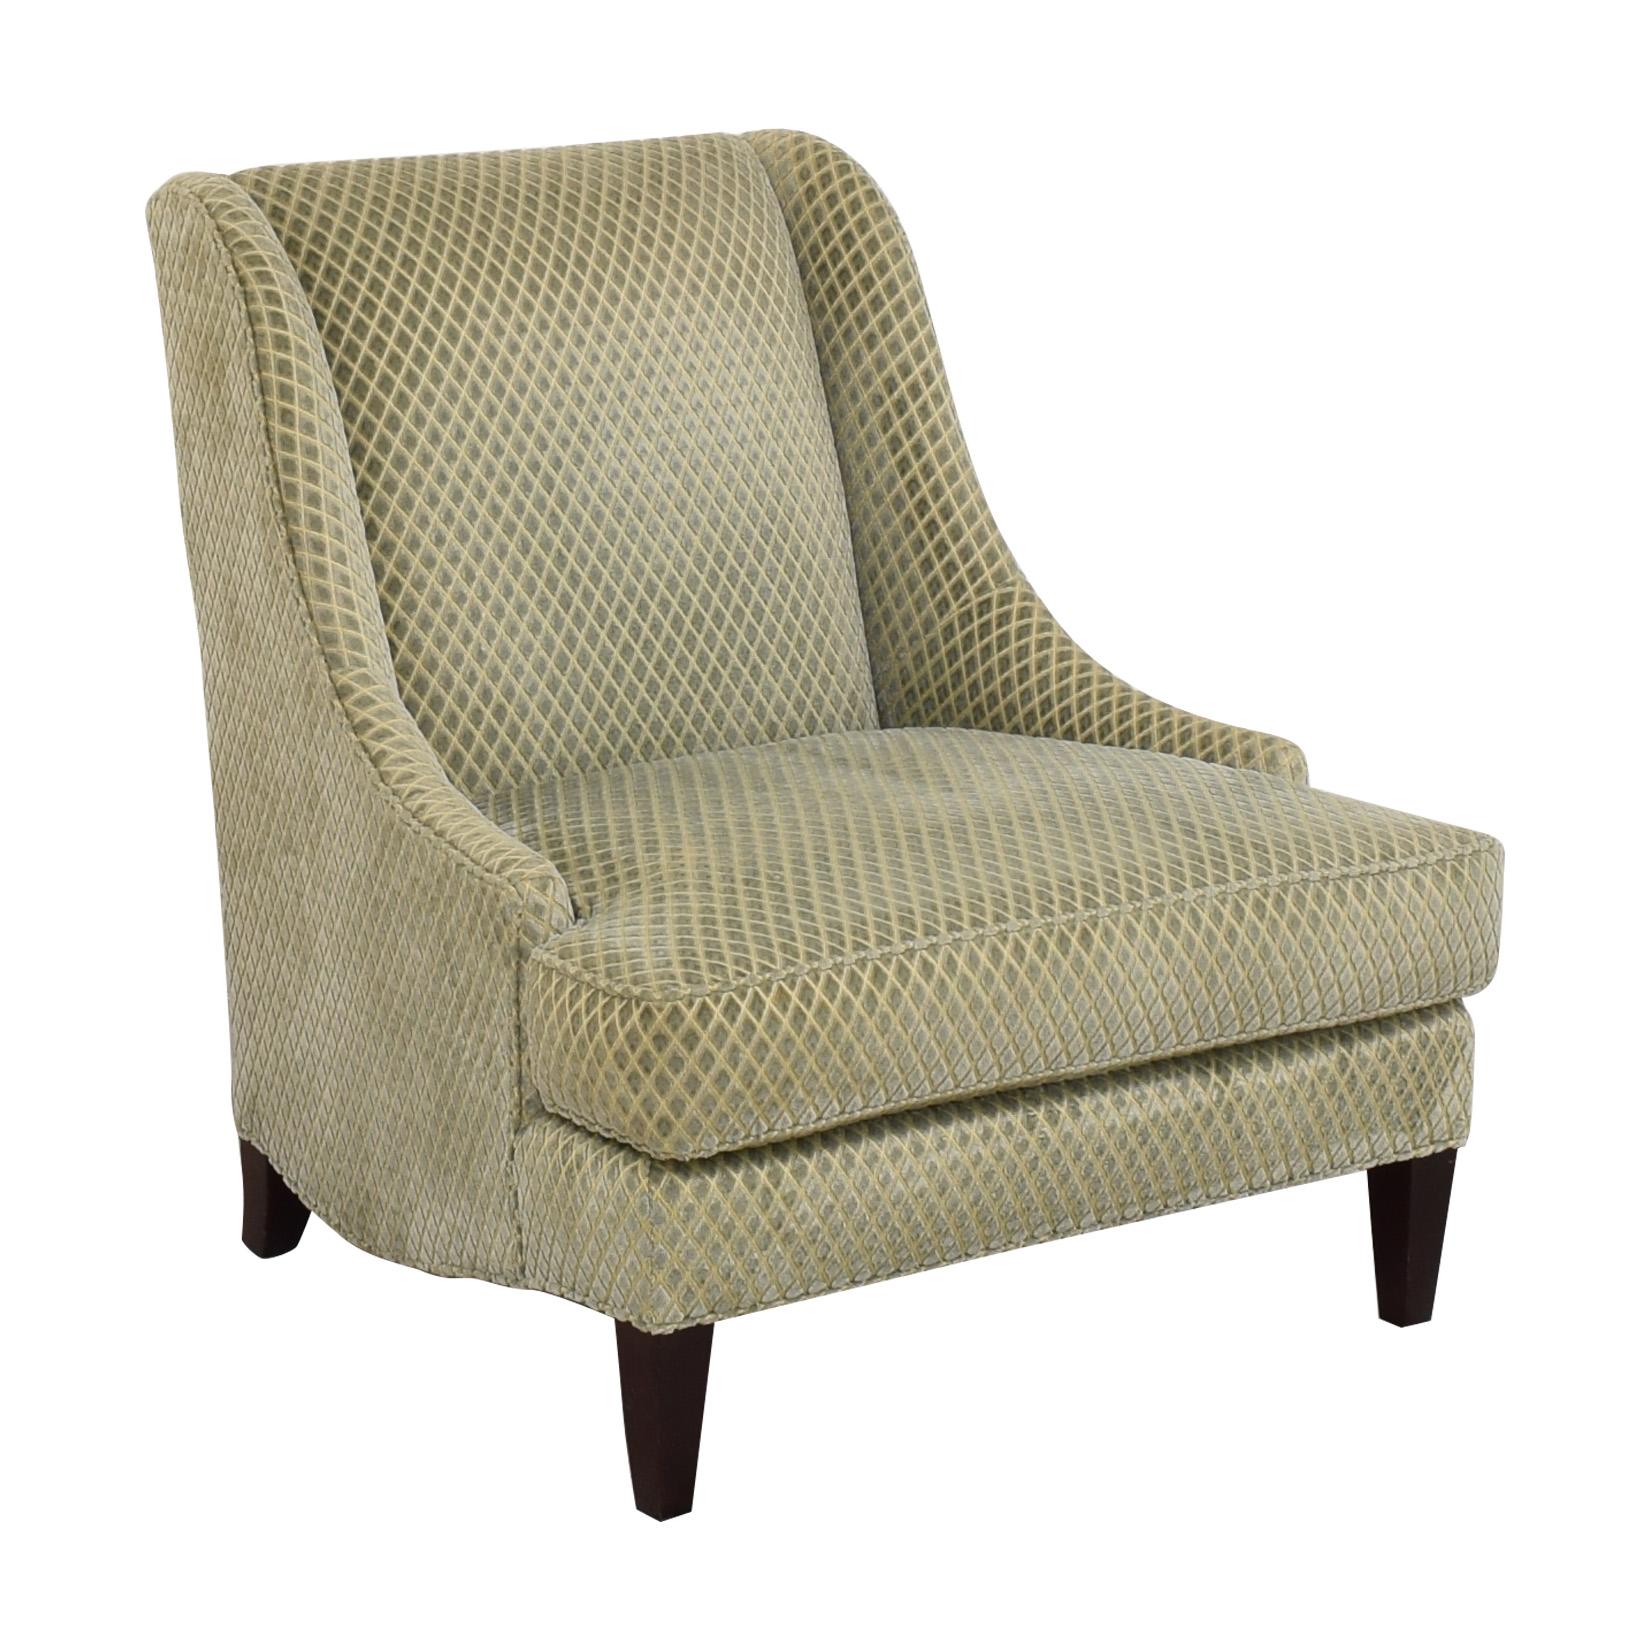 Hickory White Hickory White Armless Chair ma